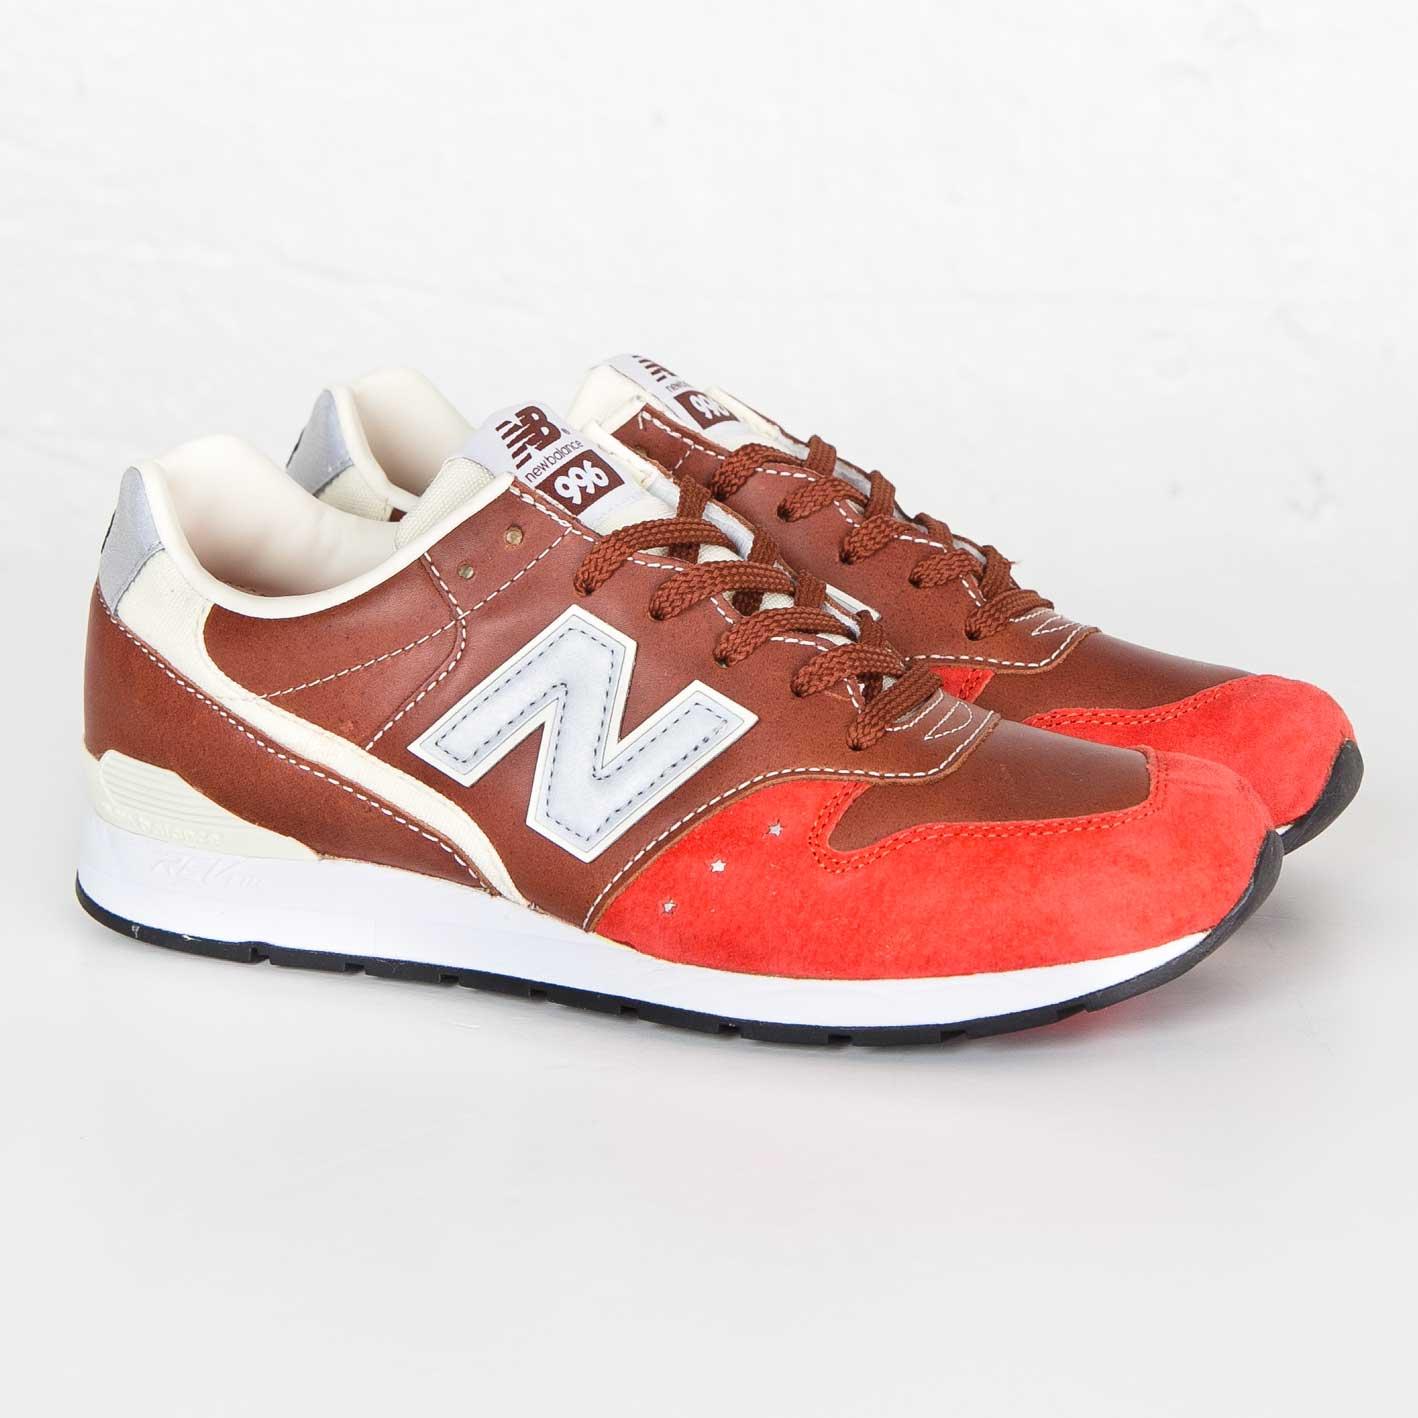 New Balance MRL996 Mrl996wm Sneakersnstuff I Sneakers